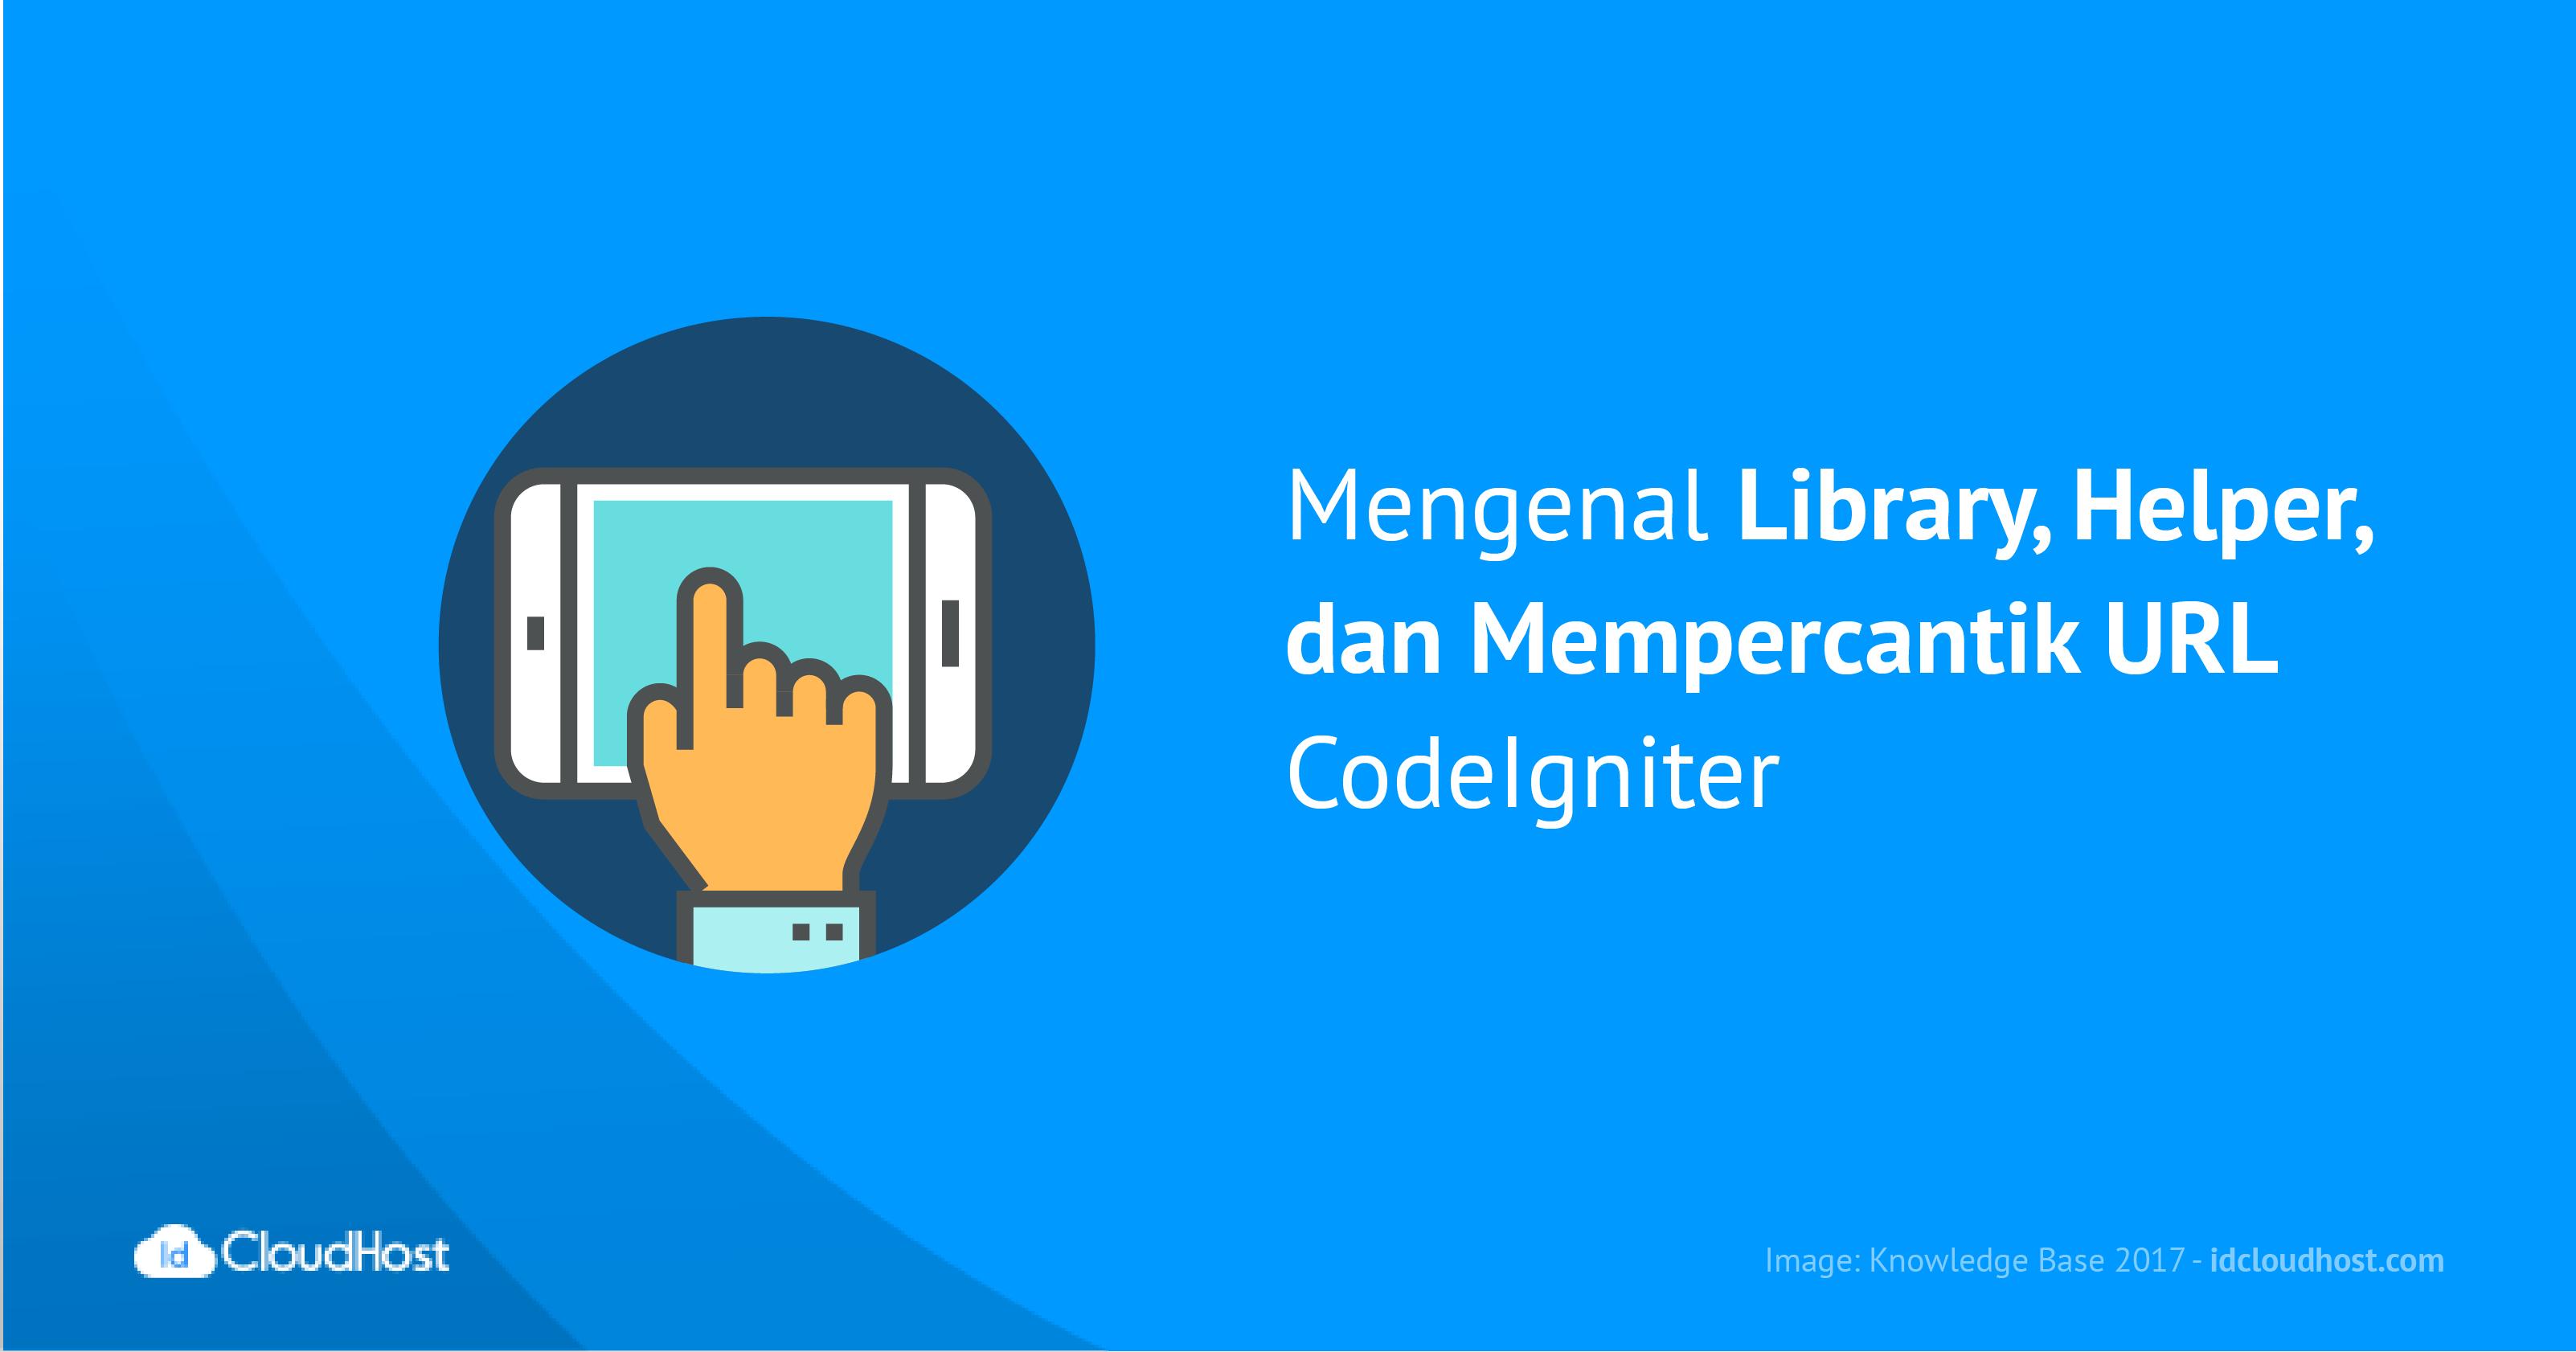 Mengenal Library, Helper, dan Mempercantik URL CodeIgniter